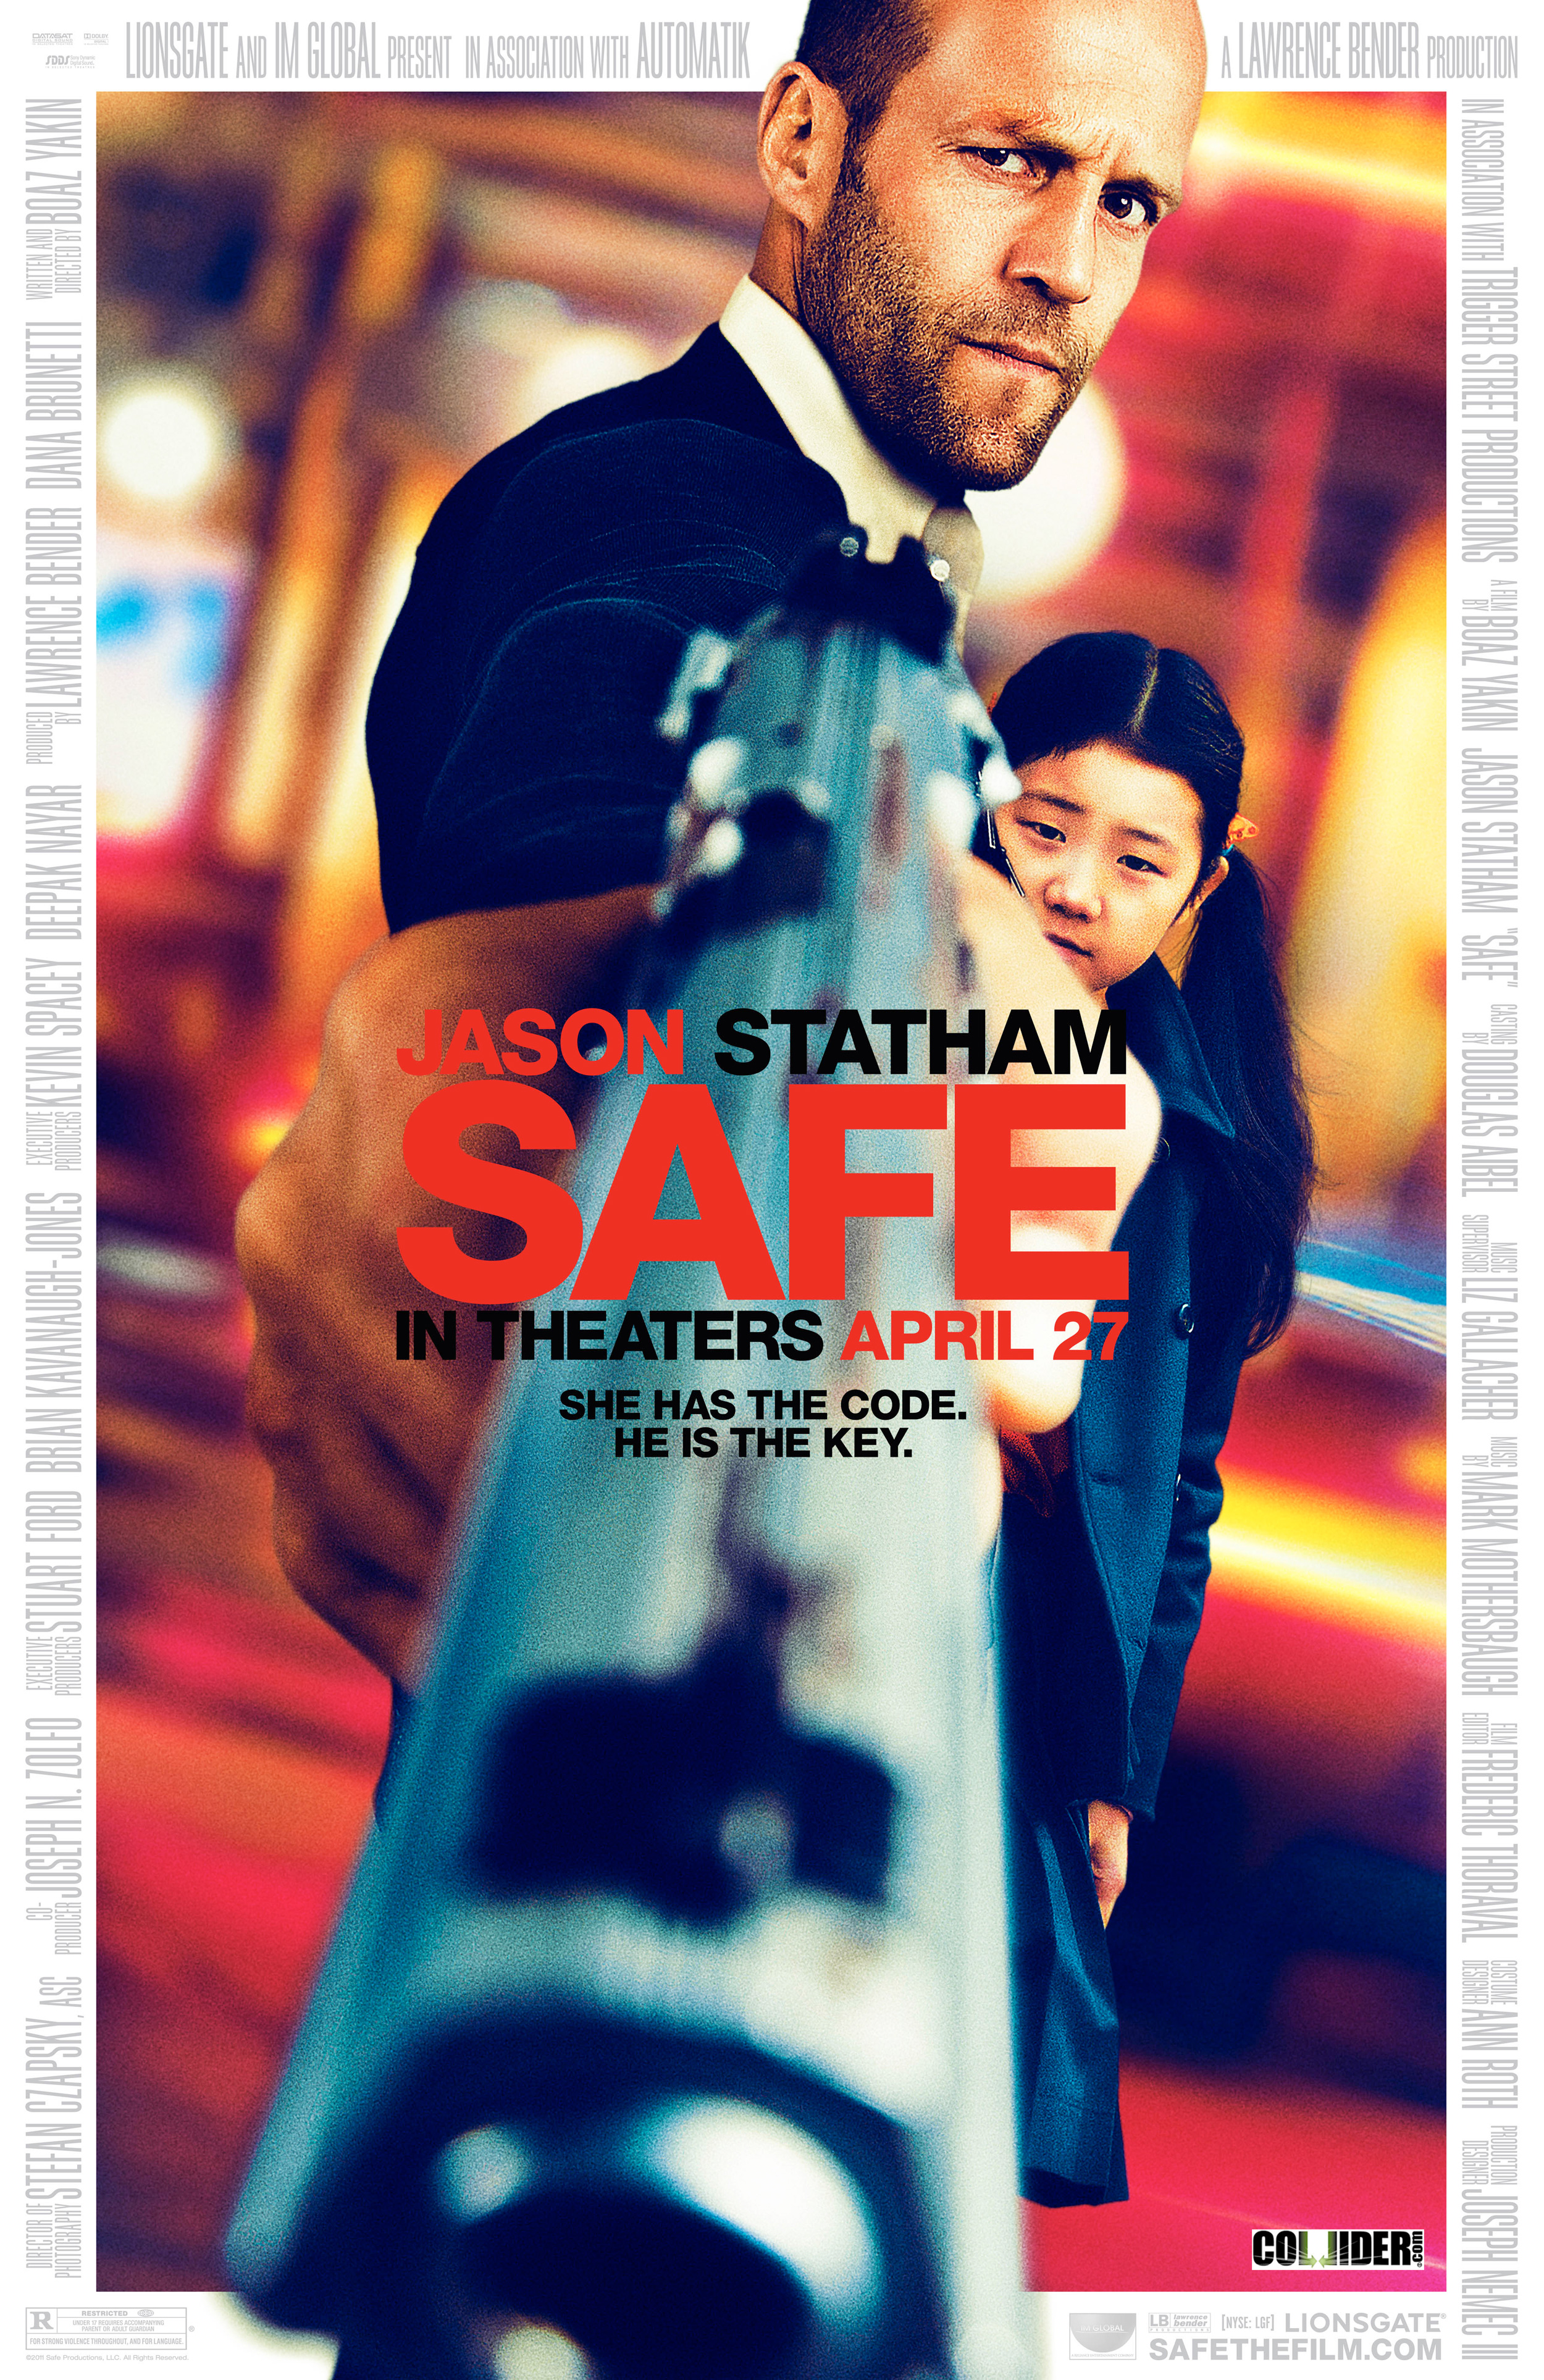 safe-movie-poster-jason-statham.jpg